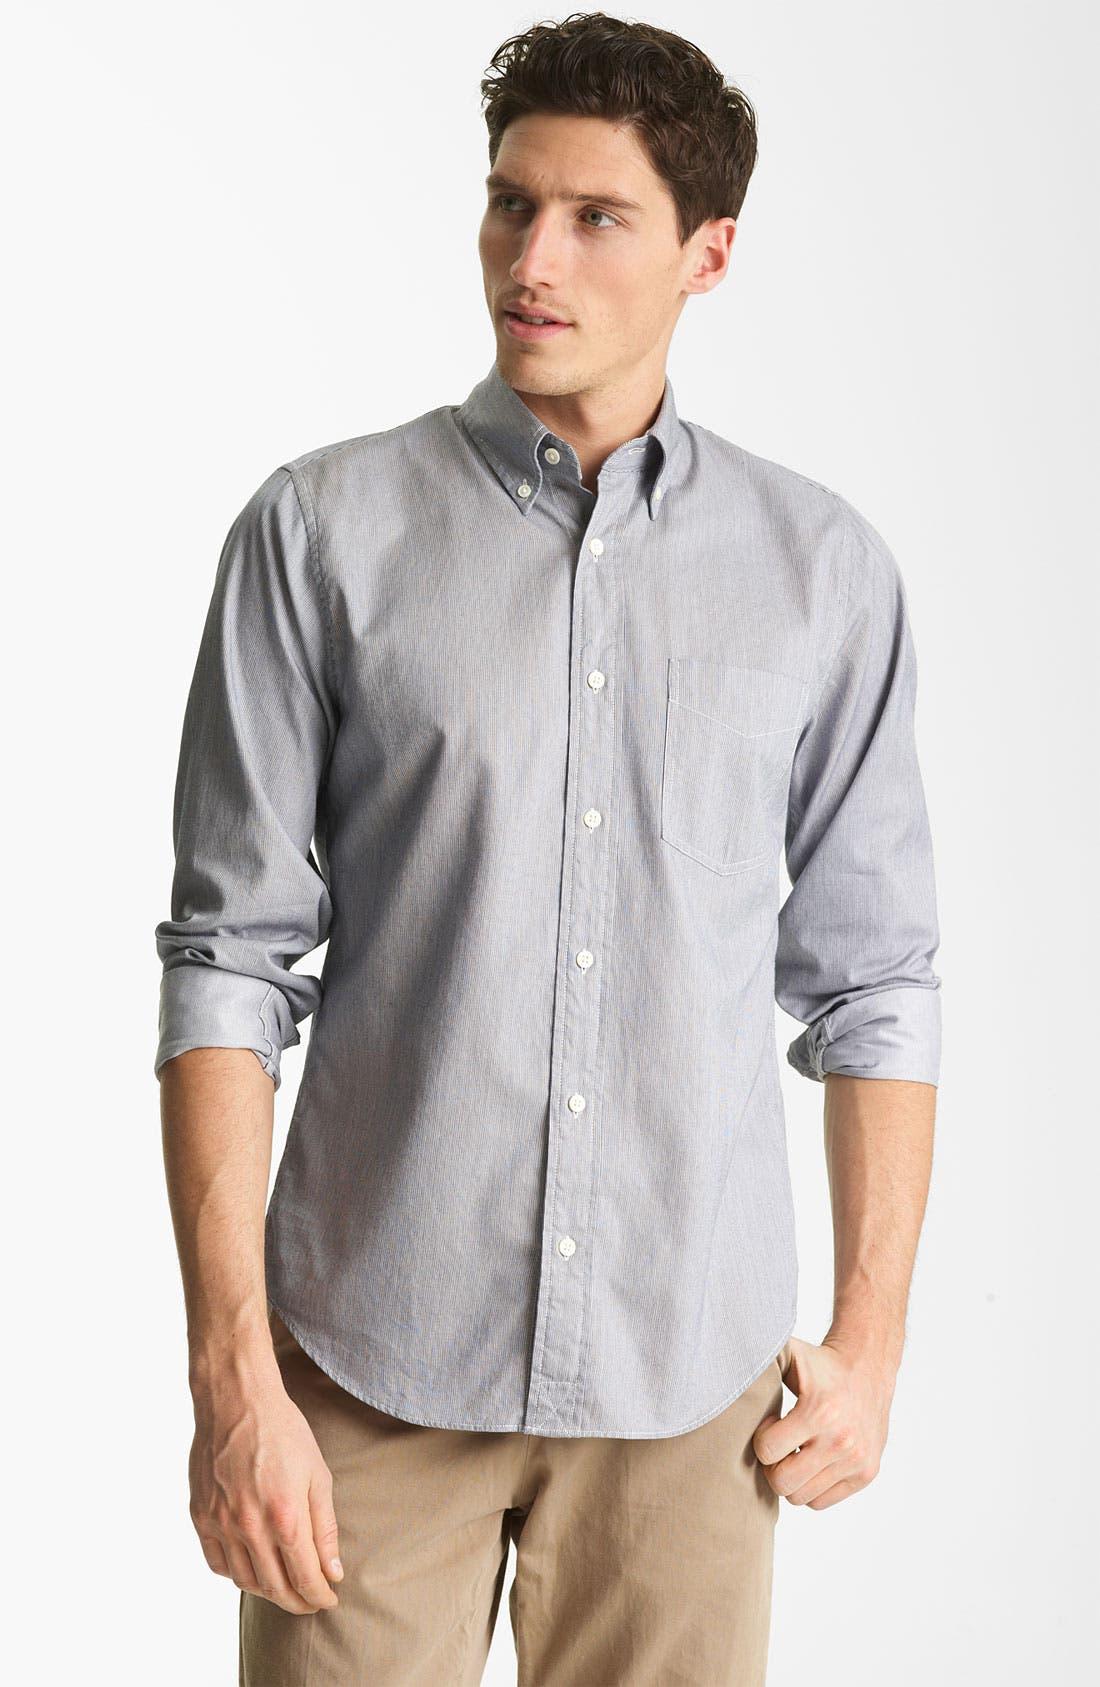 Alternate Image 1 Selected - Jack Spade 'Mills' Stripe Sport Shirt